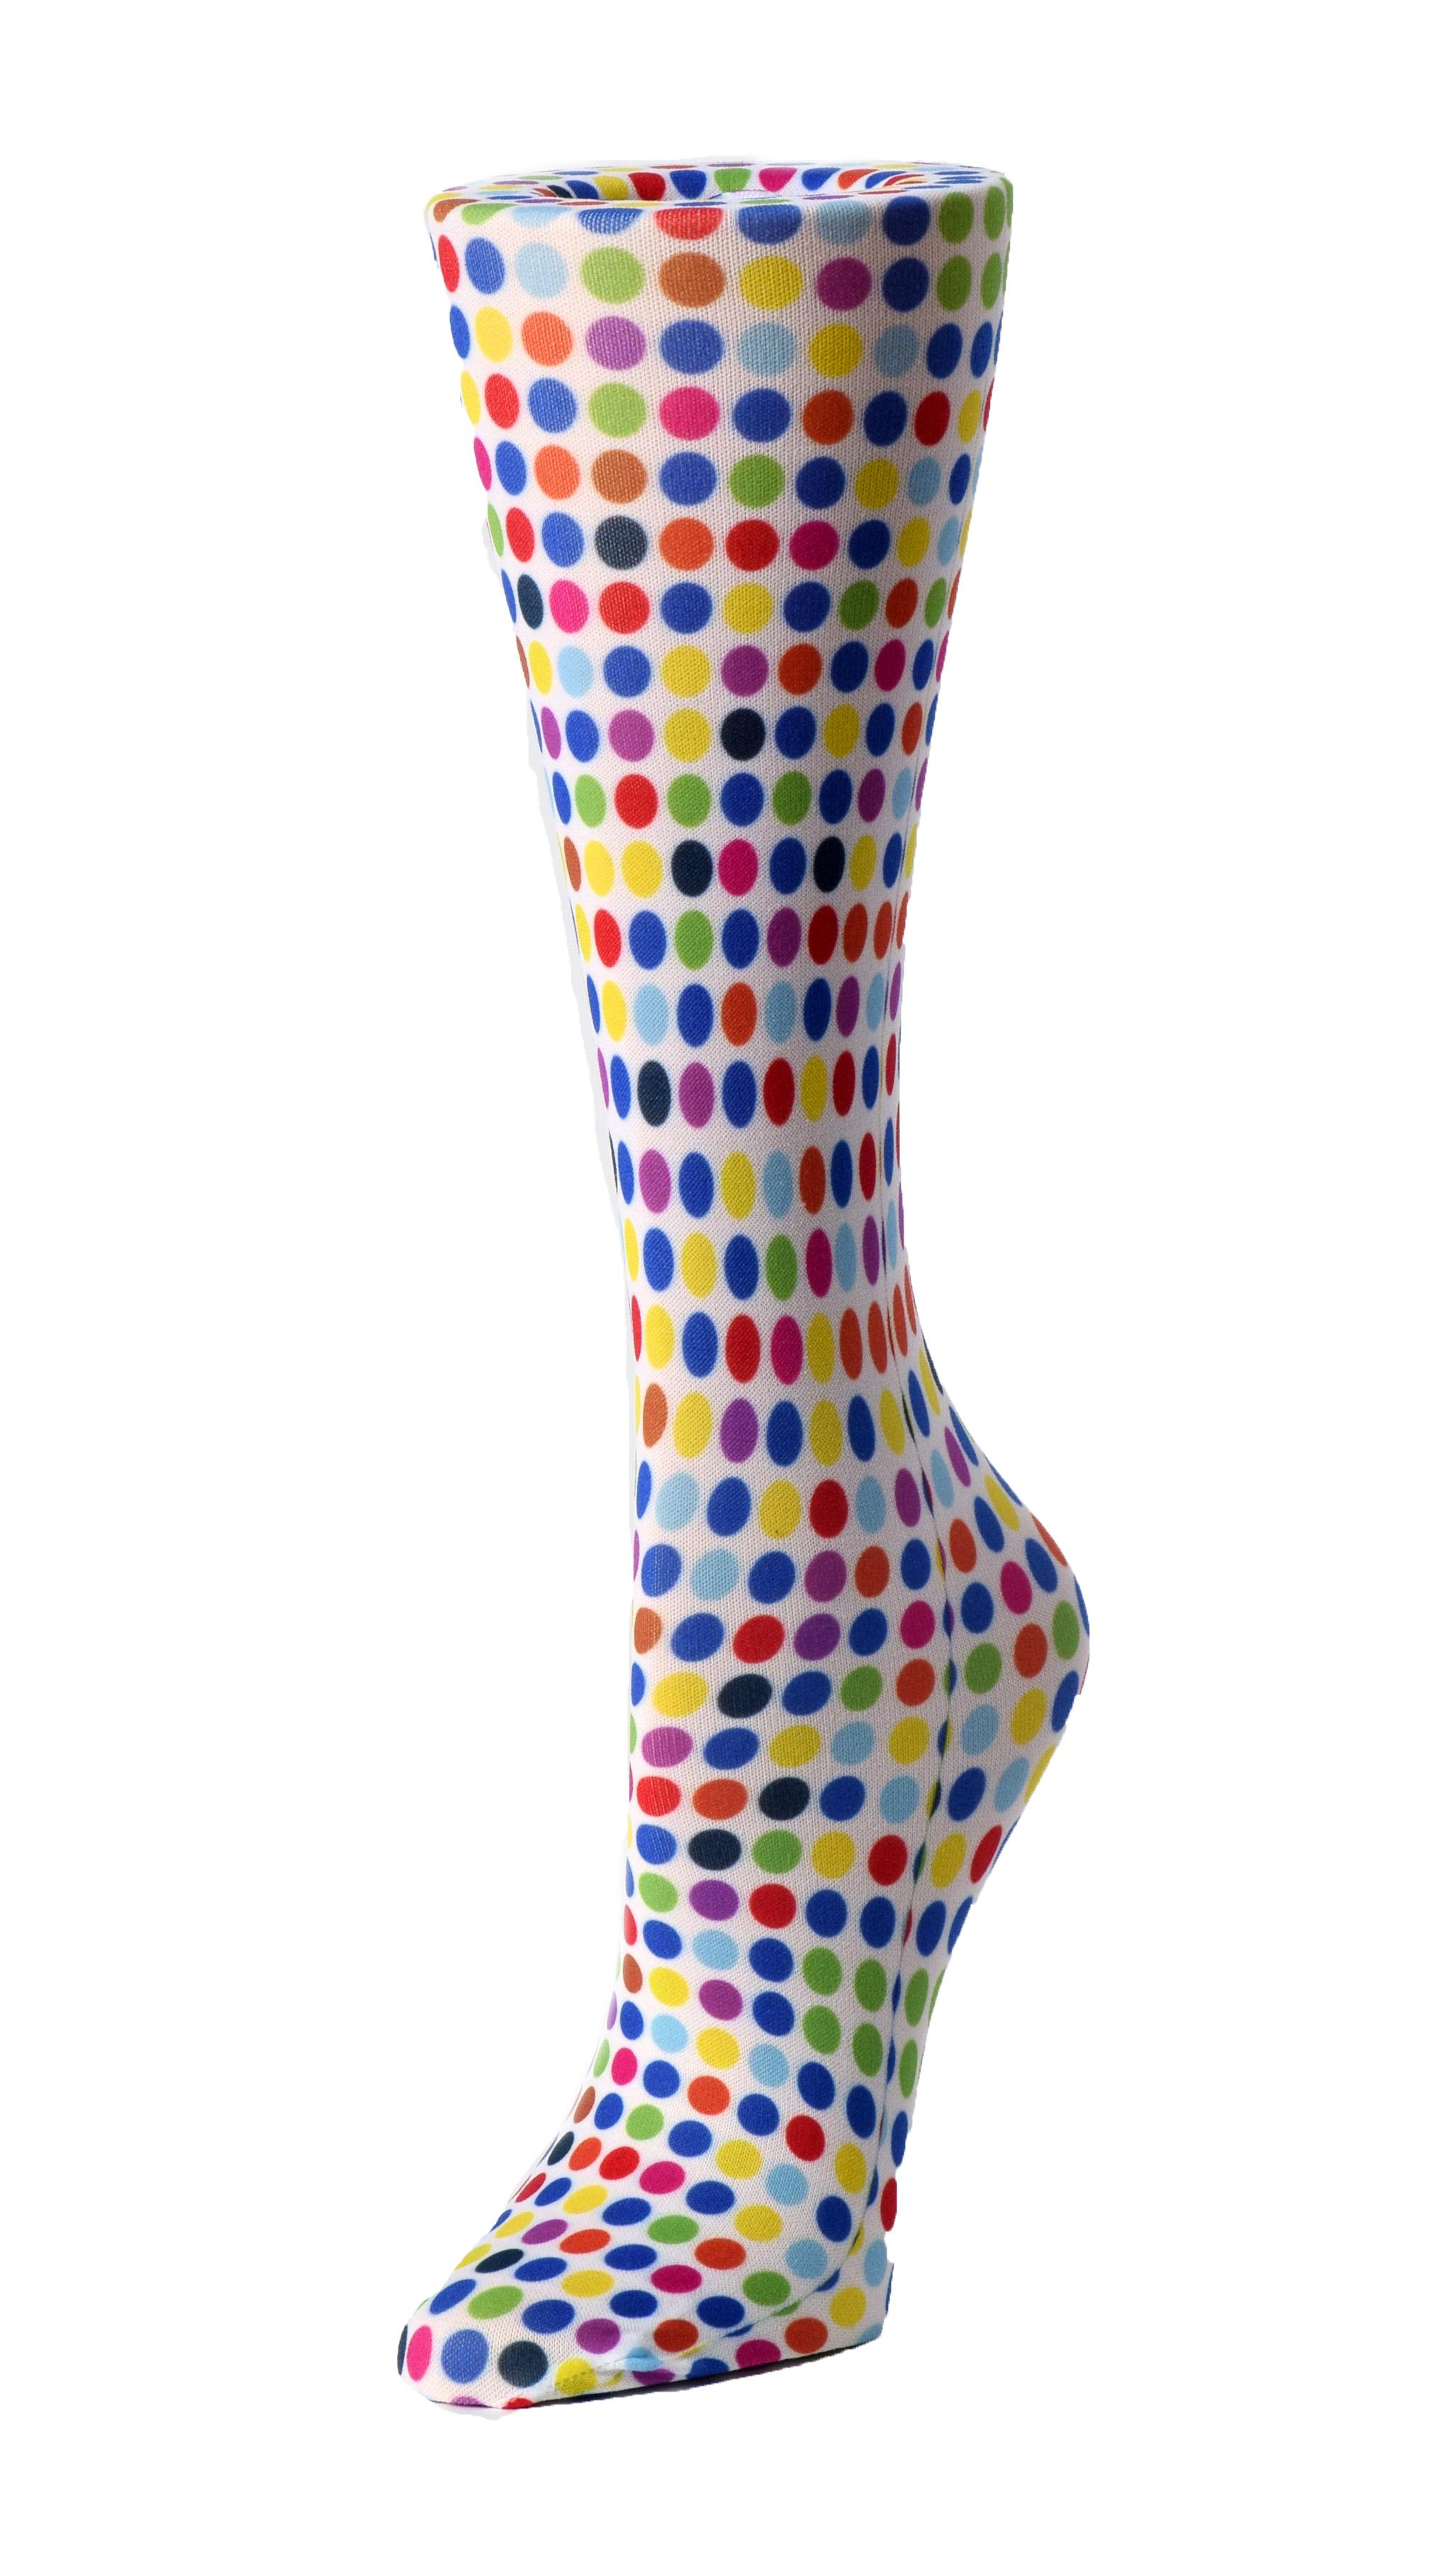 Chevrons, Paisleys, & Polka Dots - Cutieful Compression Socks-Cutieful